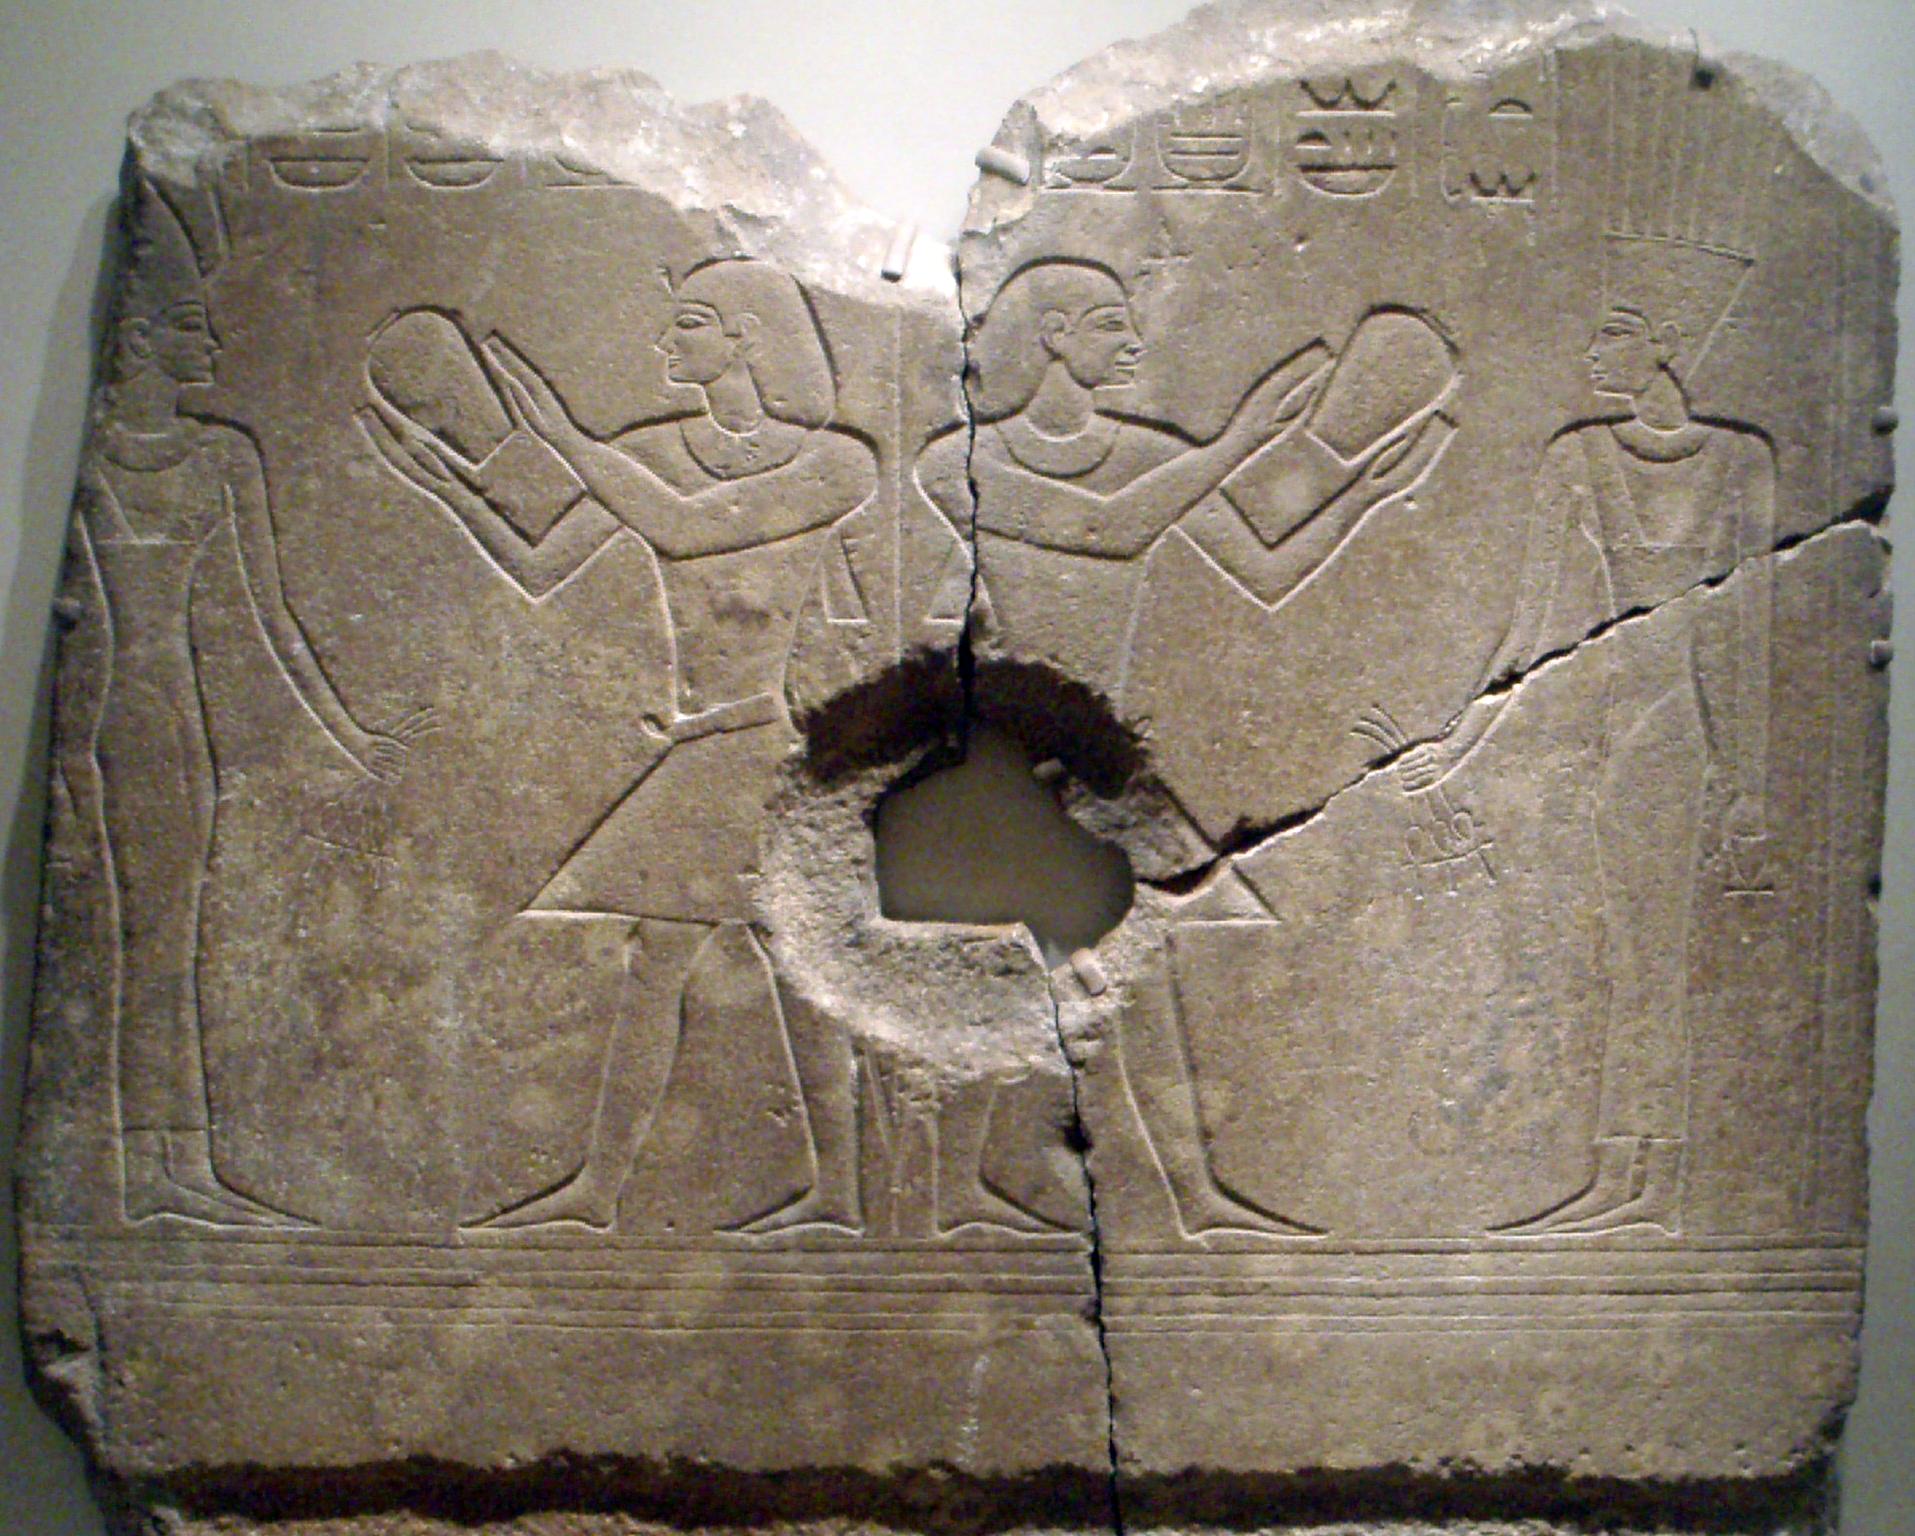 http://upload.wikimedia.org/wikipedia/commons/3/3a/SobekhotepIII-DualRelief_BrooklynMuseum.png